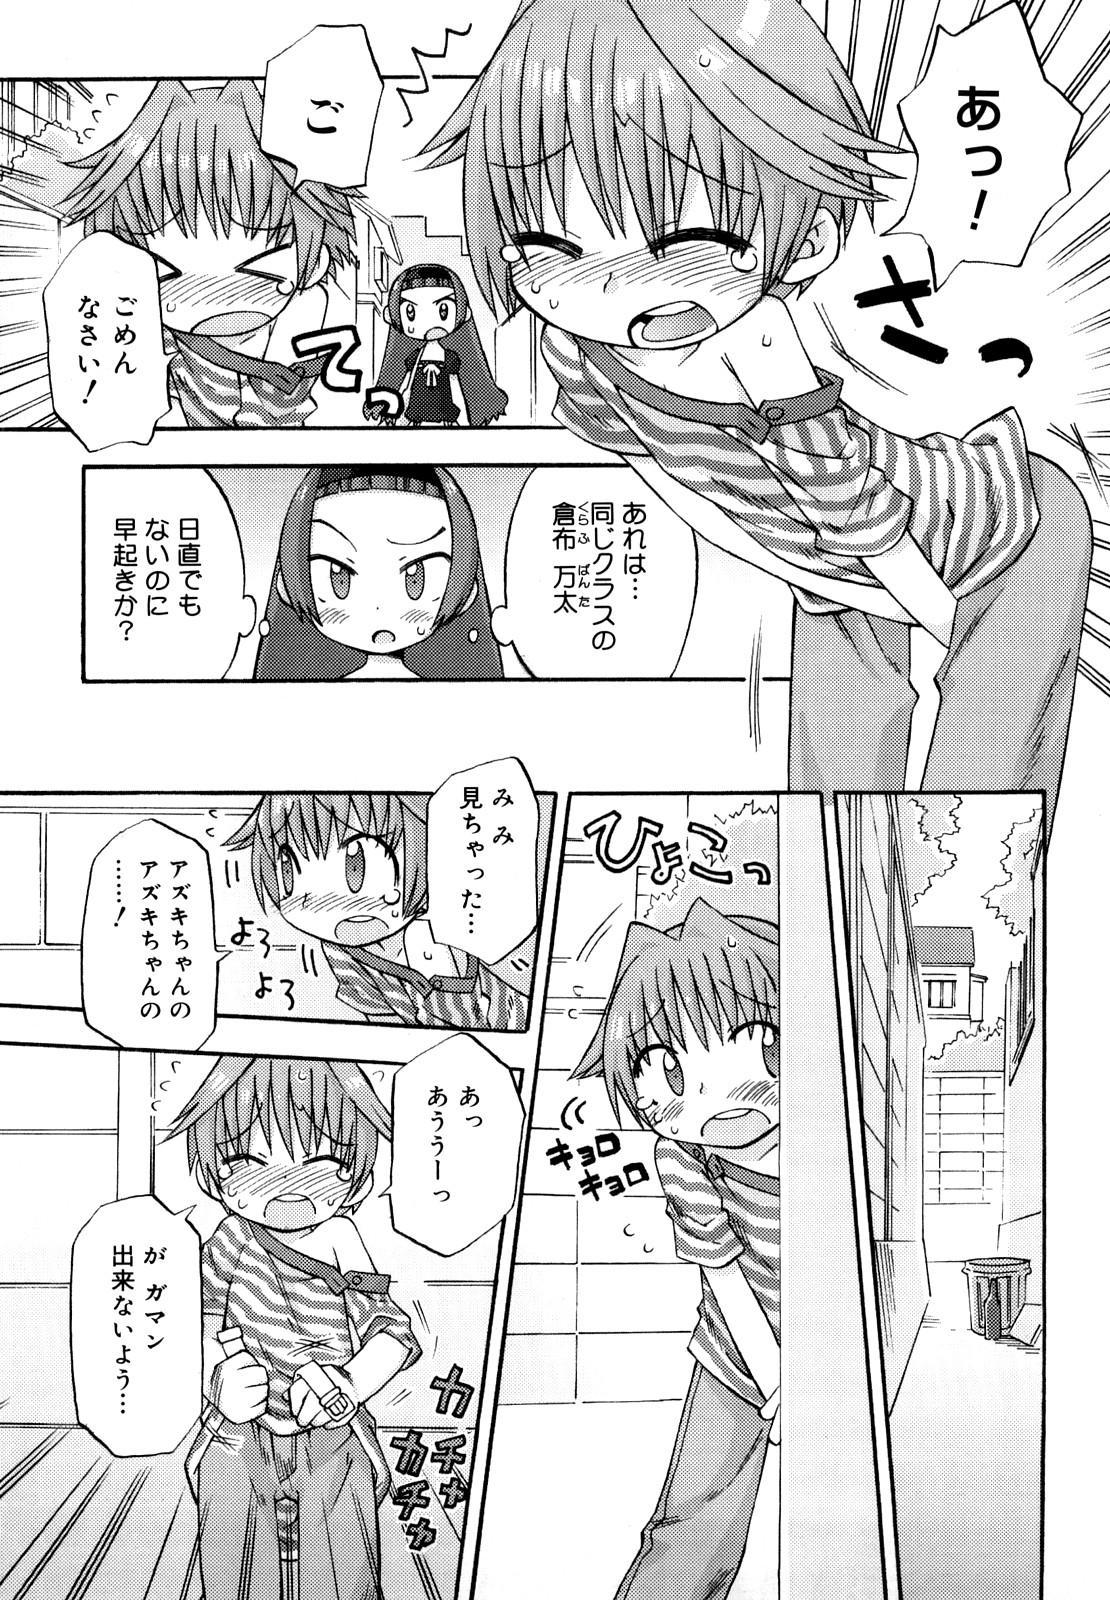 Hatsuden Pandakun! Shinsouban 7